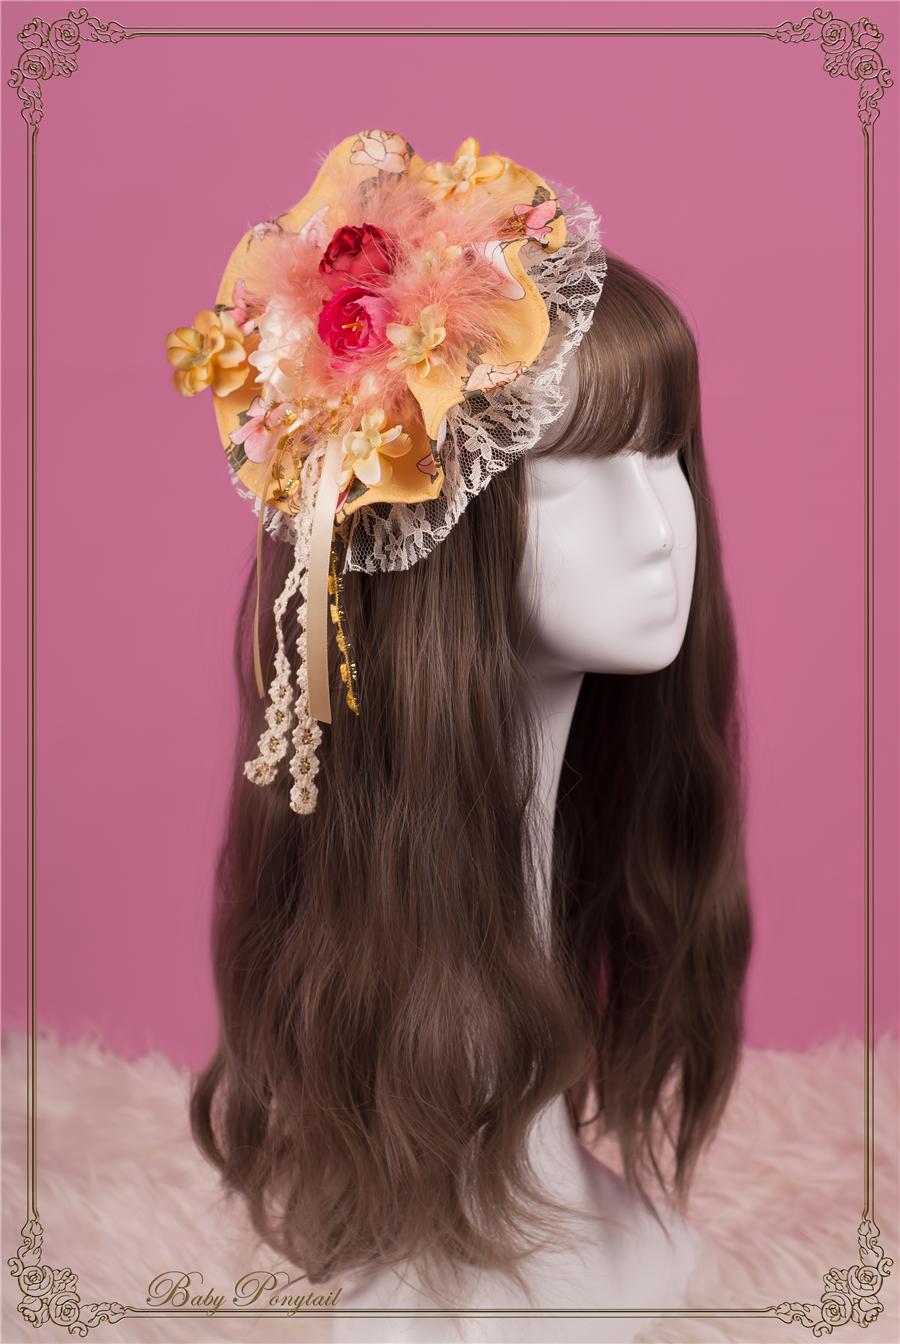 Babyponytail_Accessory_Flower Head Dress_0.jpg